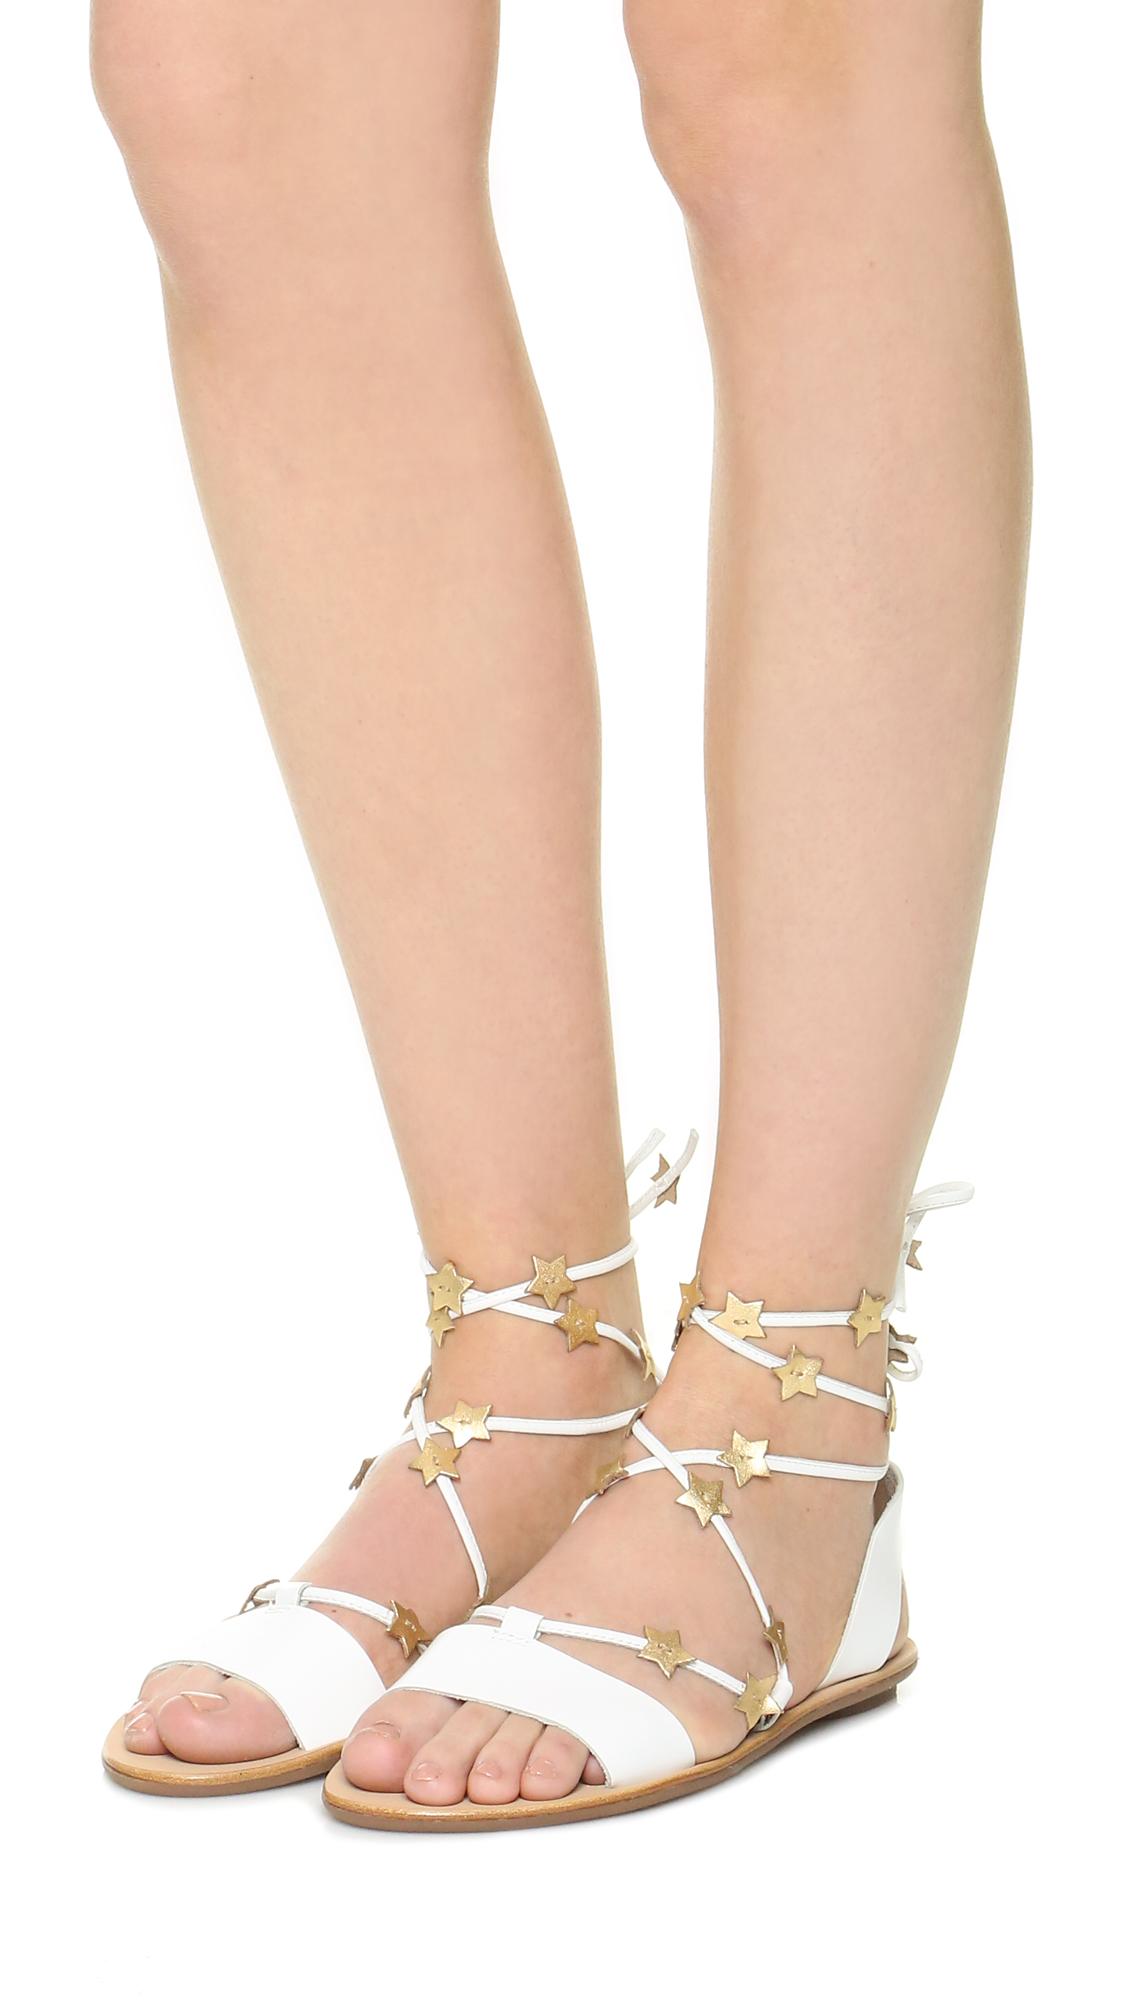 a0e52addc974 Loeffler Randall Starla Flat Sandals